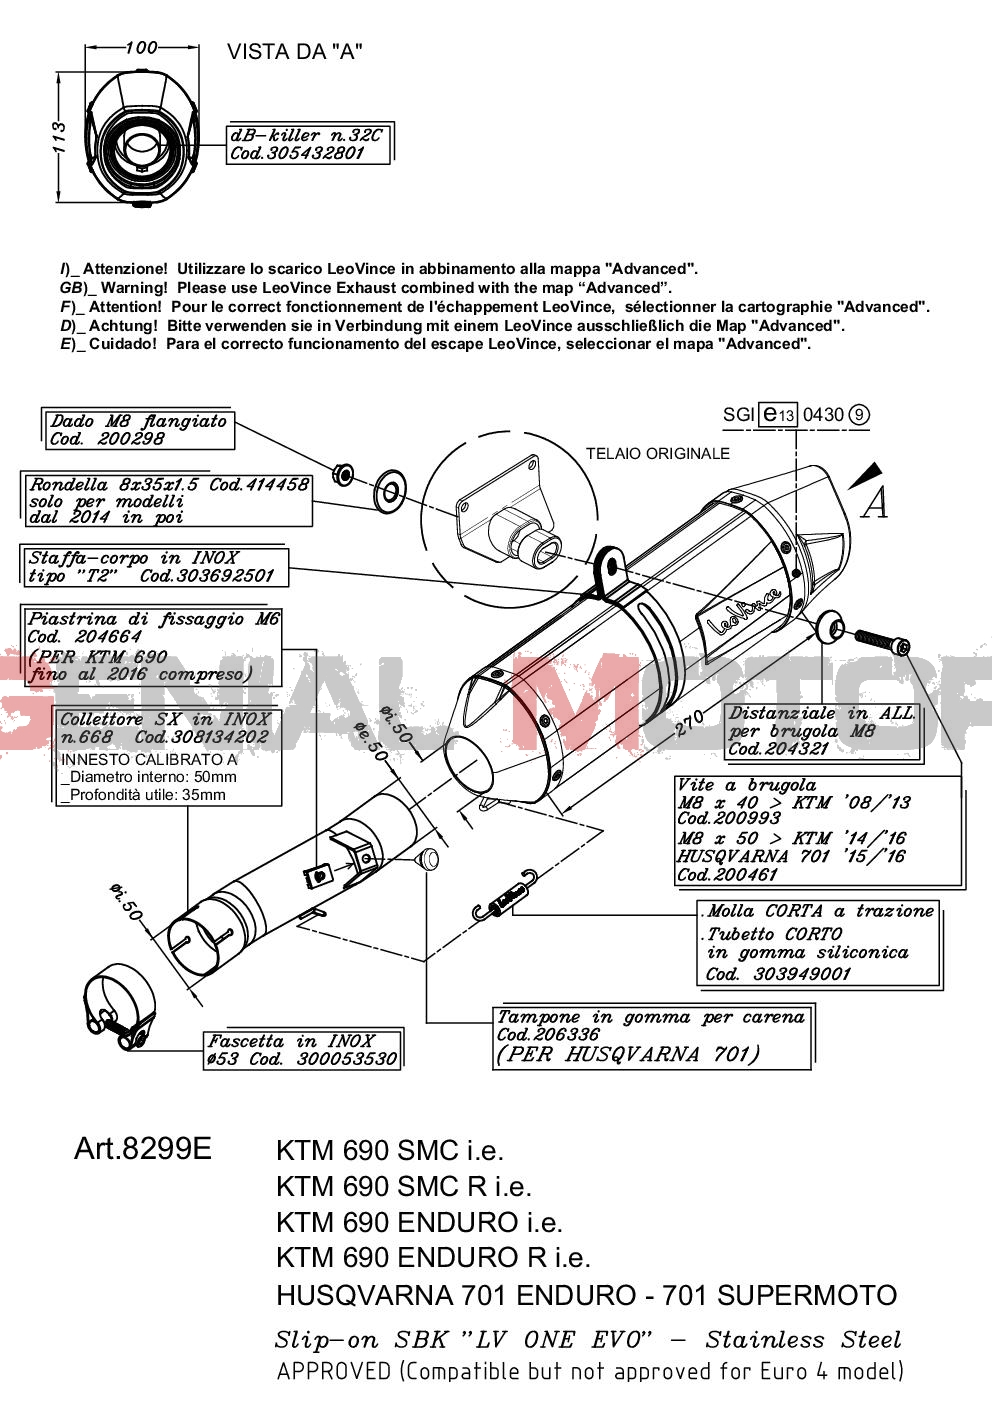 8299E Exhaust Leovince Lv One Evo Stainless Steel Husqvarna 701 Supermoto 2017 > 2020